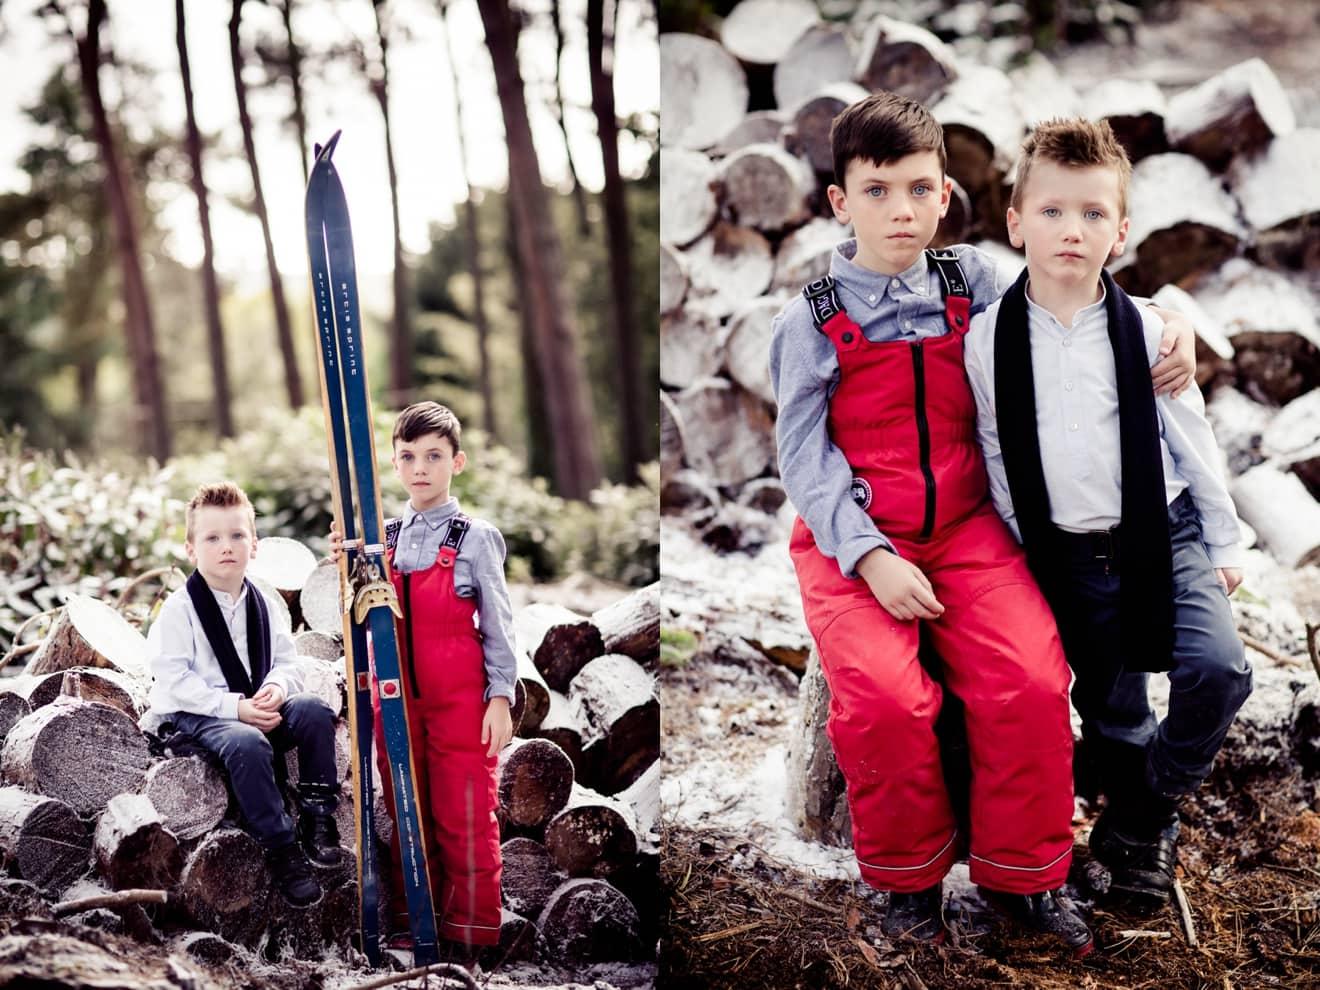 47-PLEASECREDIT-EddieJuddPhotography-PierreCarrStyling-NORDIC-FASHION-SCREENREADY